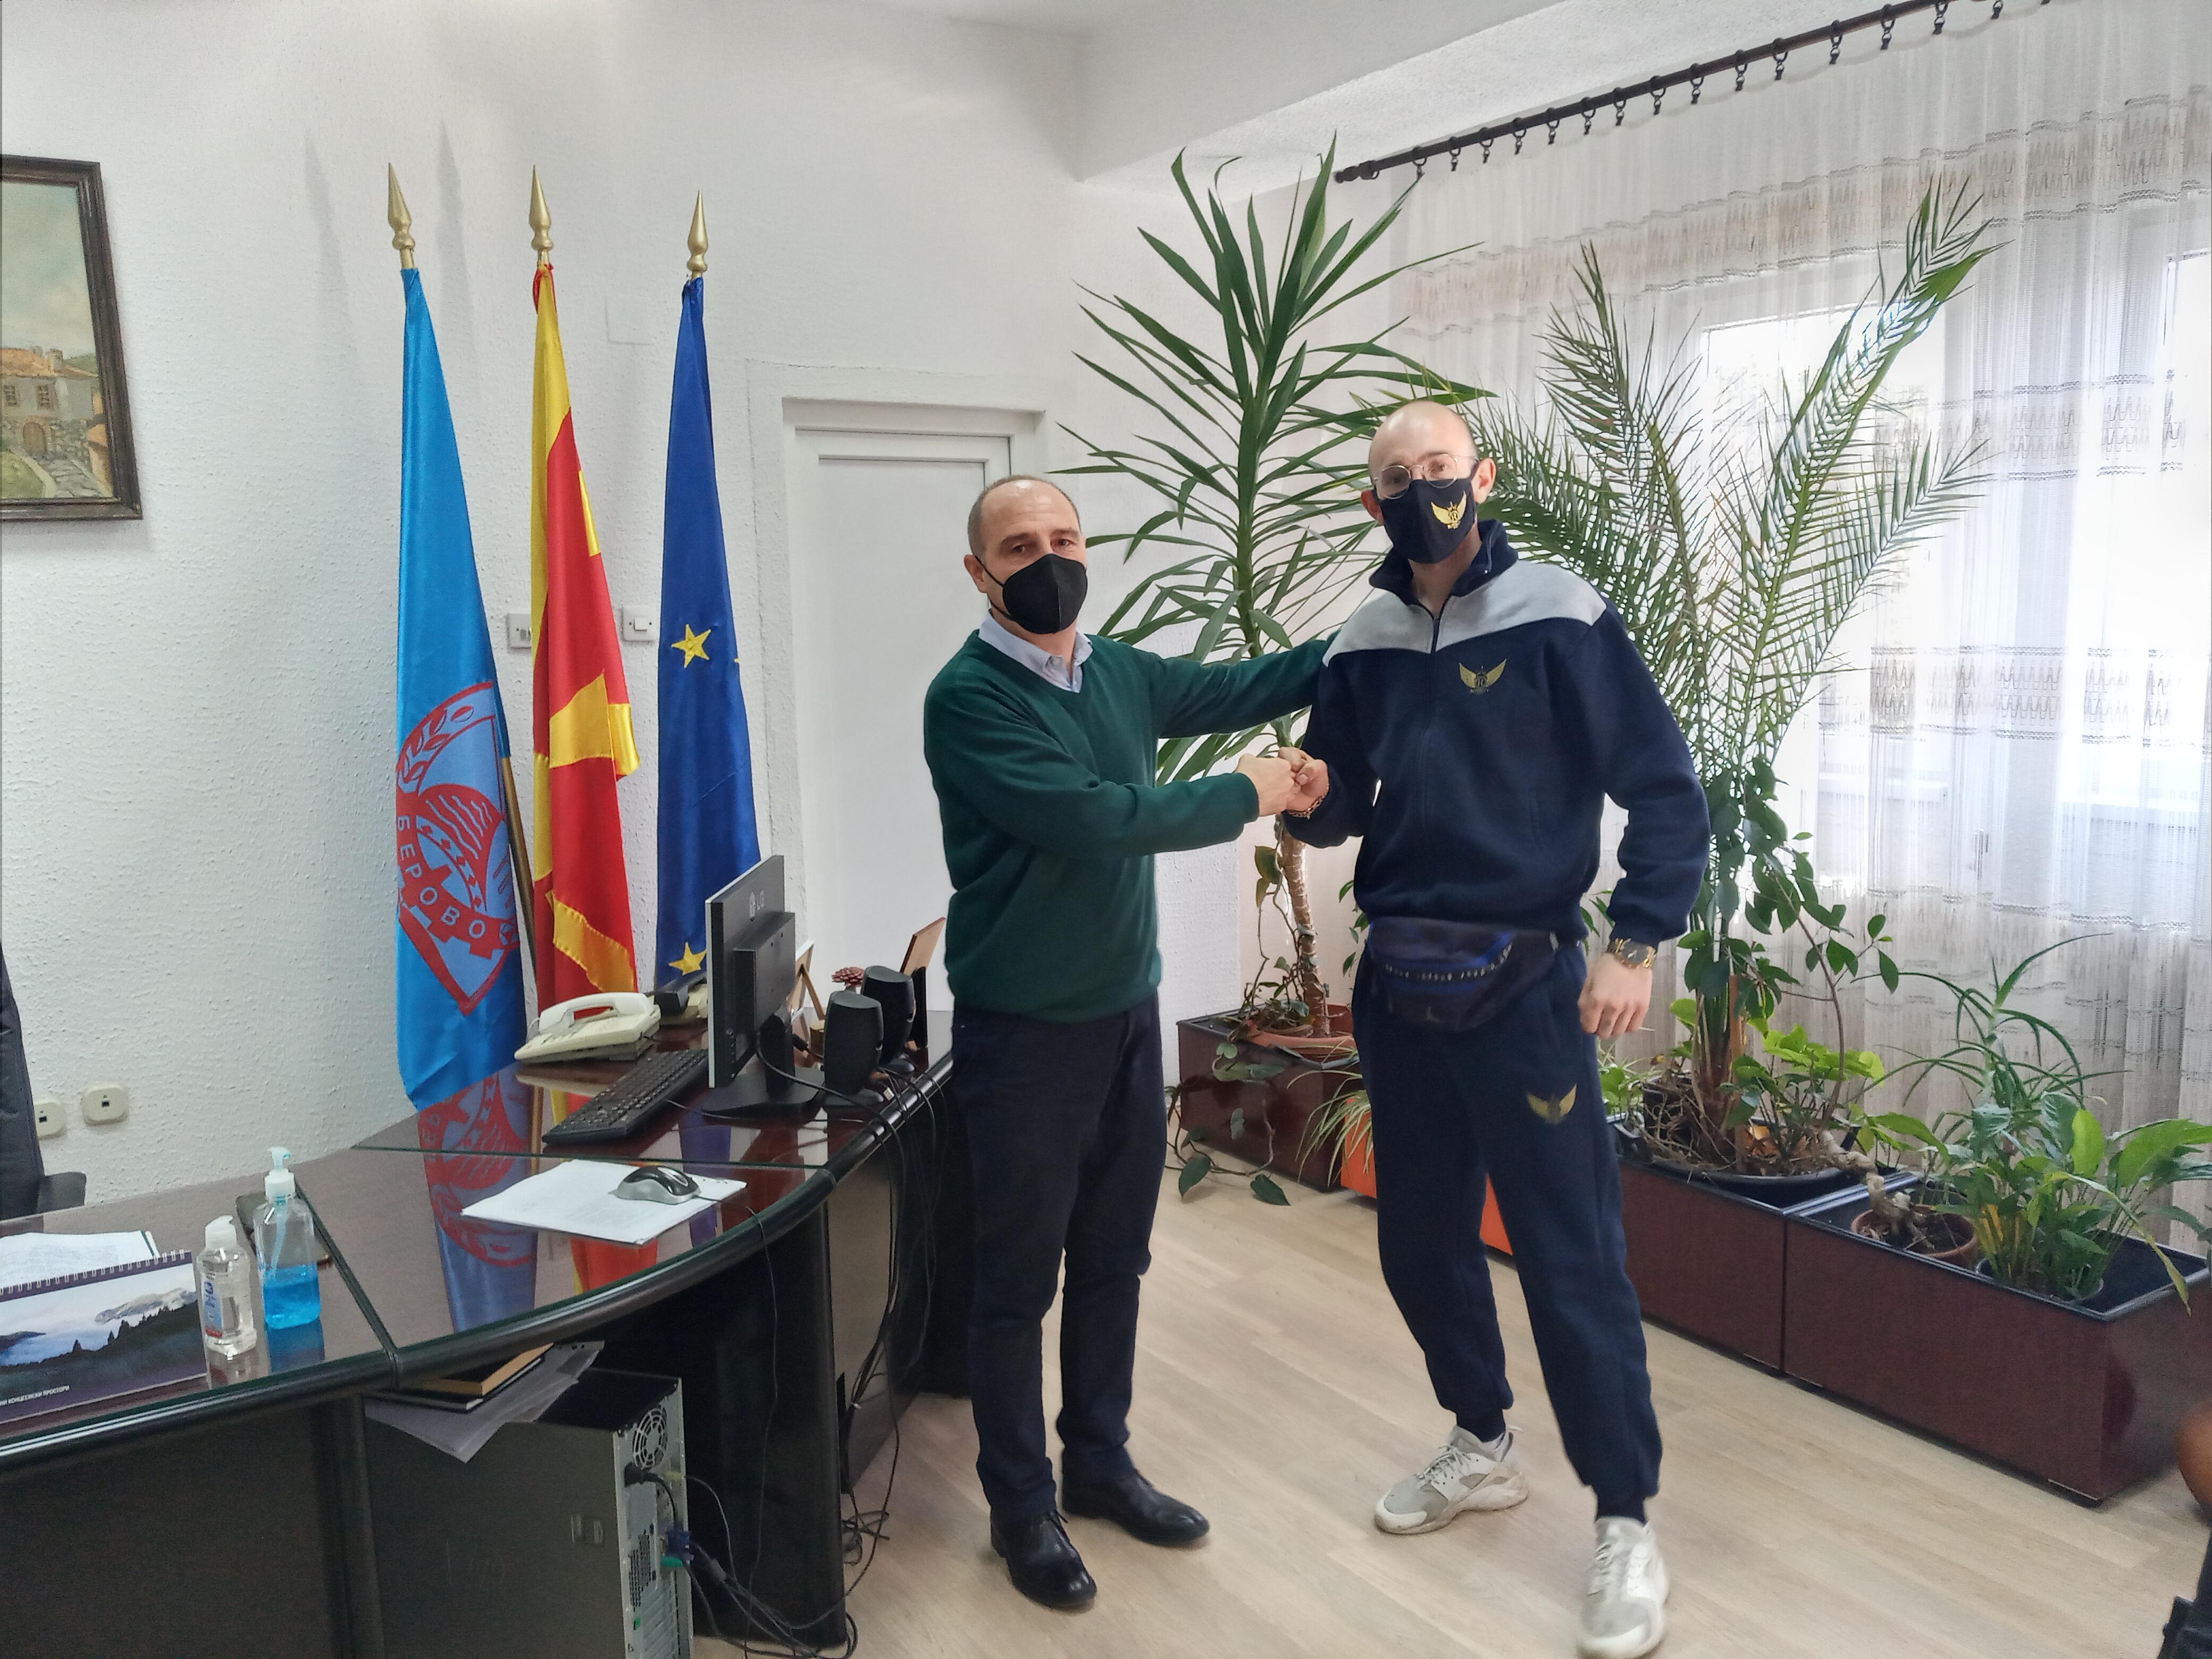 Градоначалникот Пекевски оствари средба со беровскиот starboy